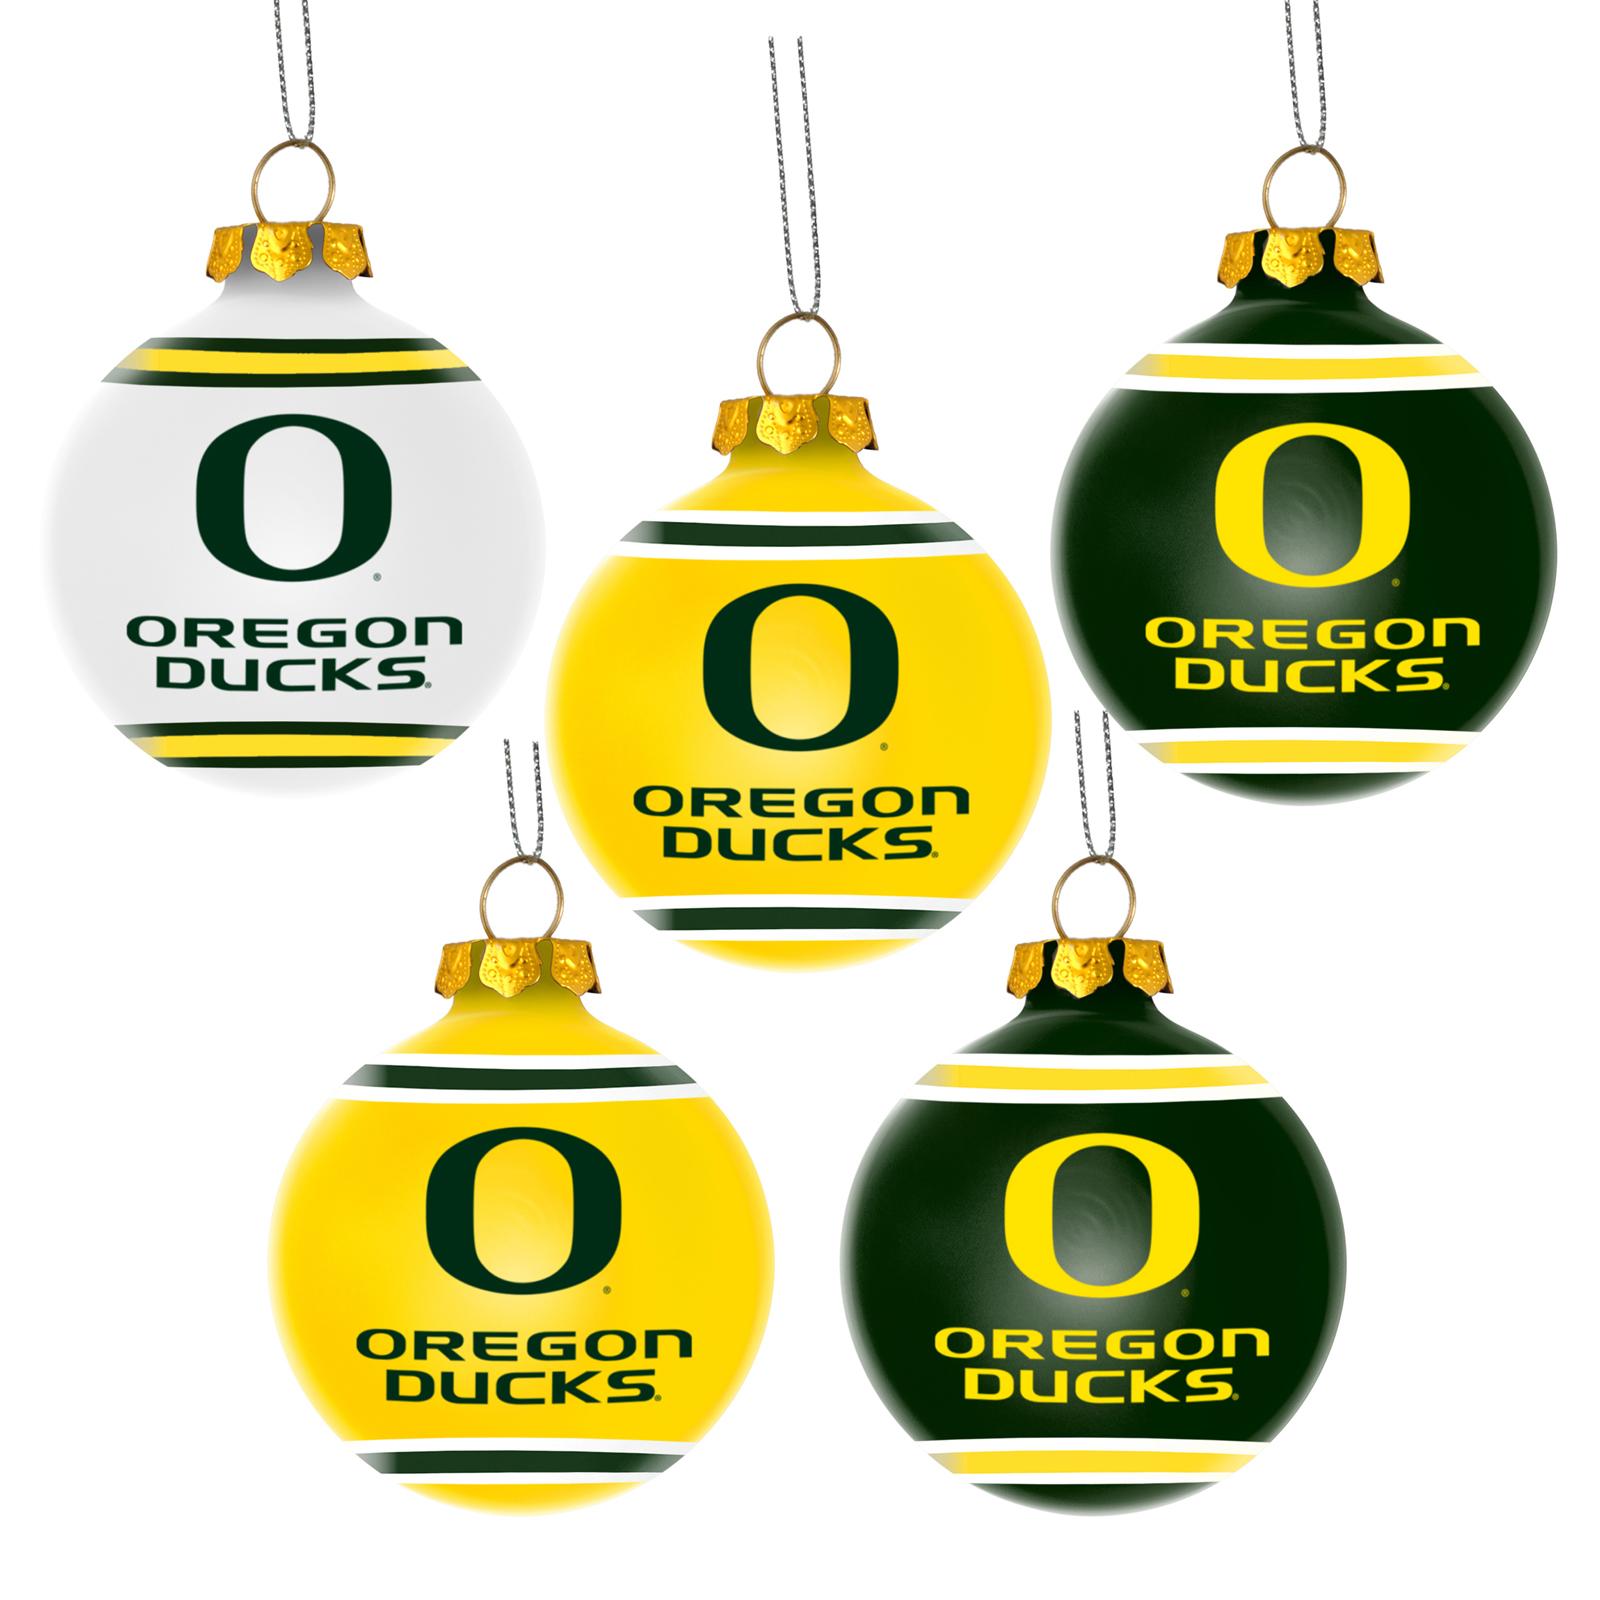 Forever Collectibles NCAA 5 Pack University of Oregon Ducks Shatterproof Ball Ornaments PartNumber: 009V002228429000P KsnValue: 2228429 MfgPartNumber: 185662